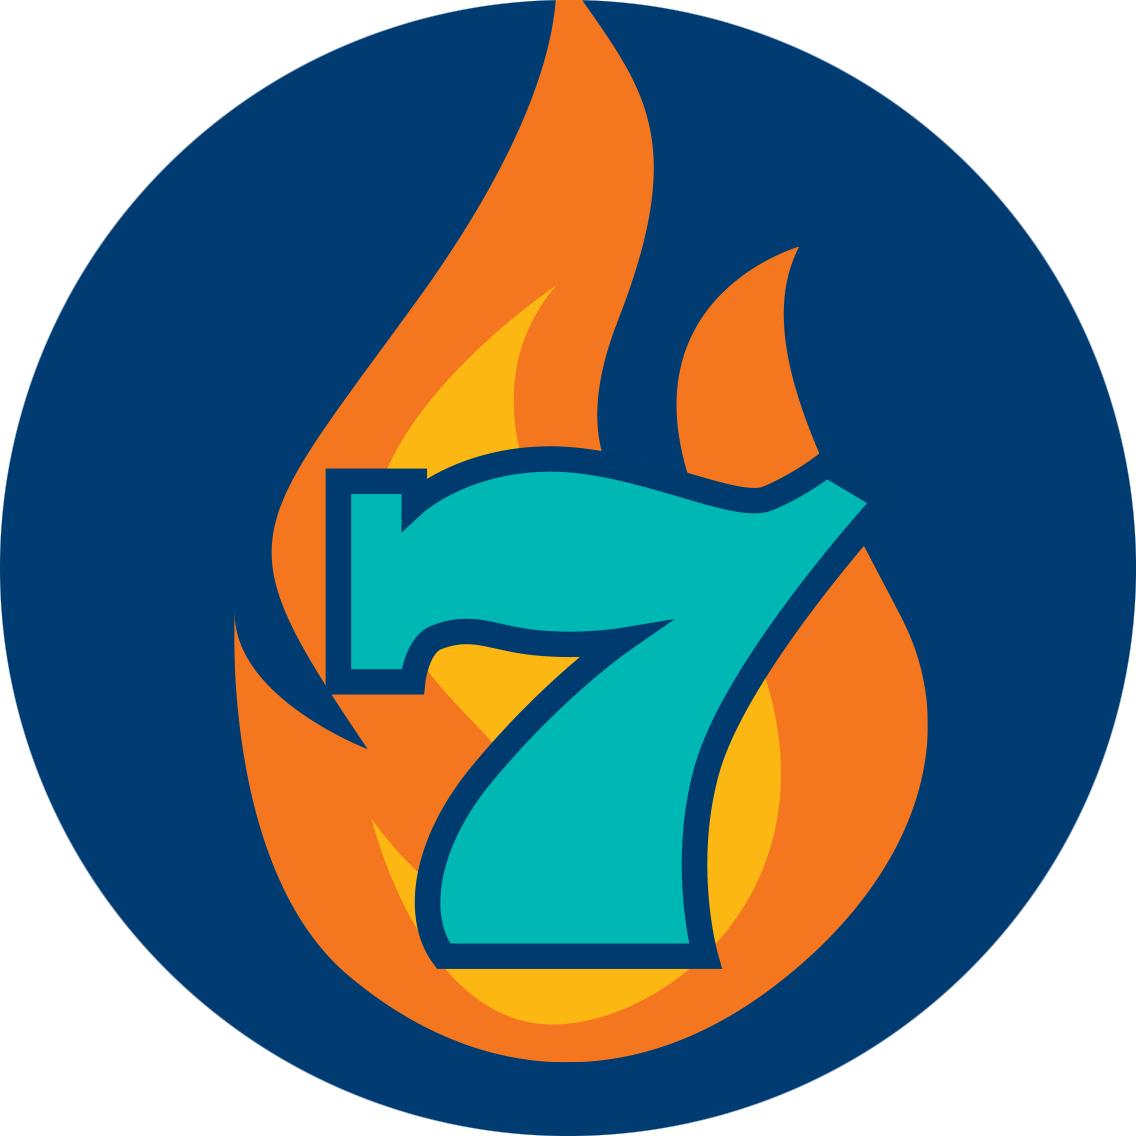 7 on a blaze of flames.